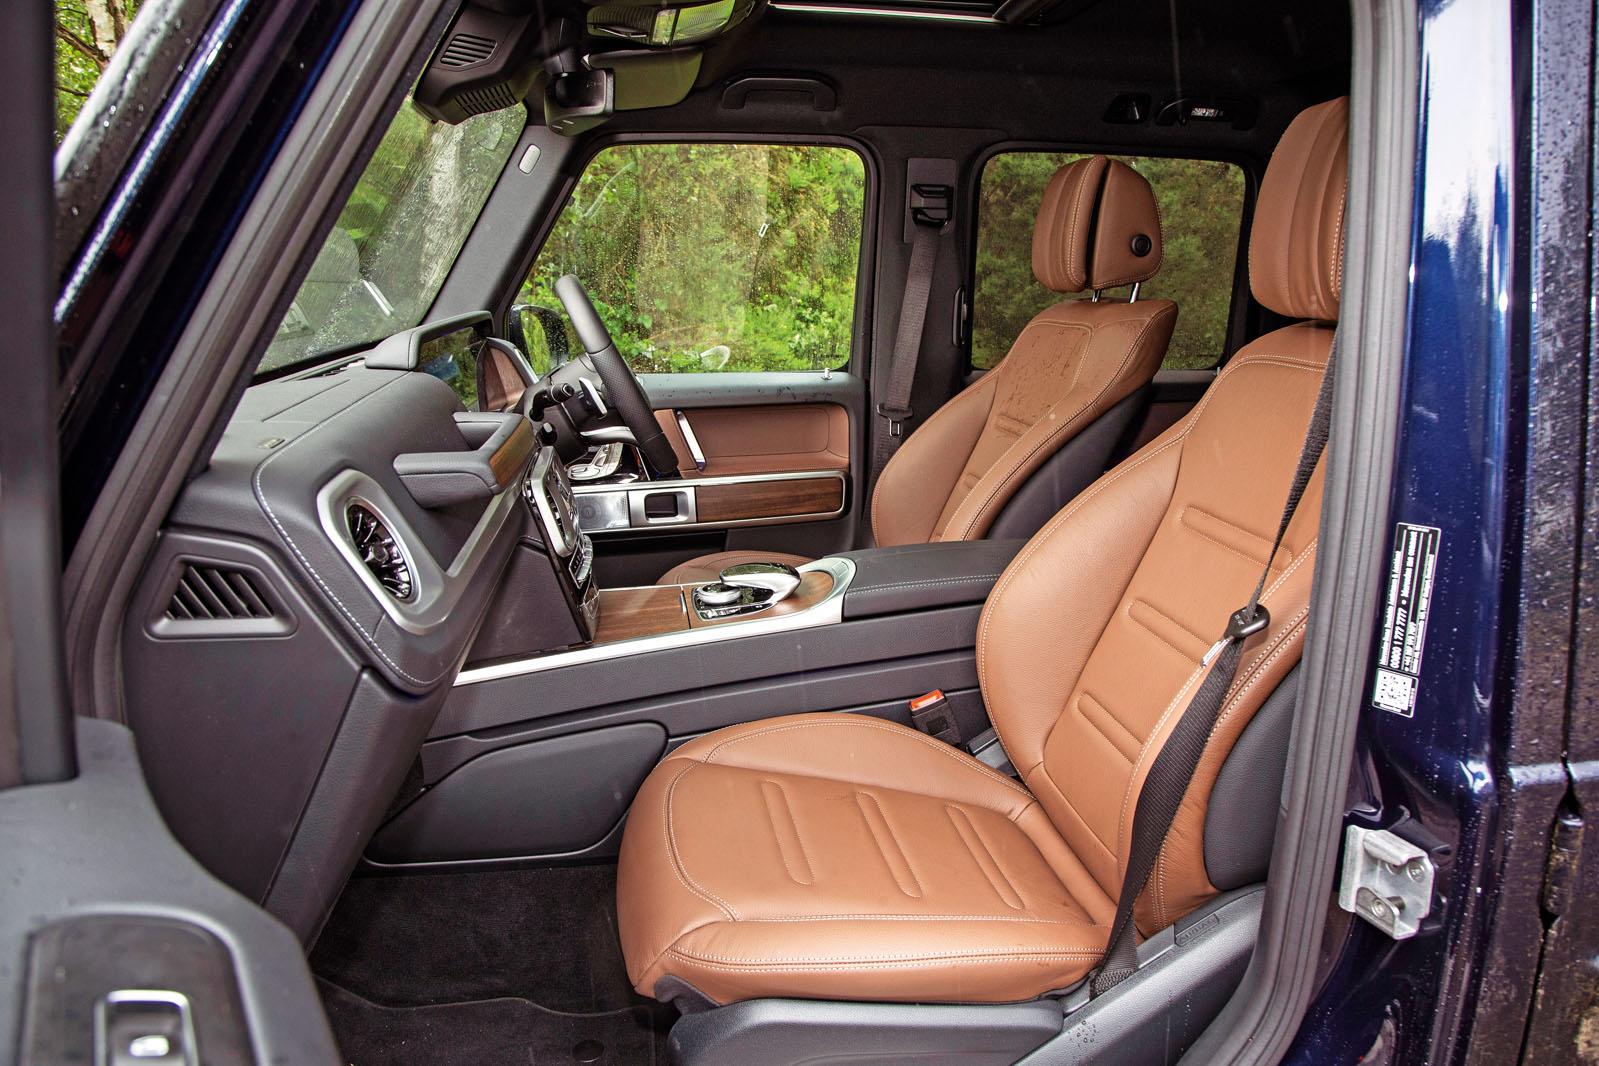 Mercedes Benz G Class Review 2021 Autocar